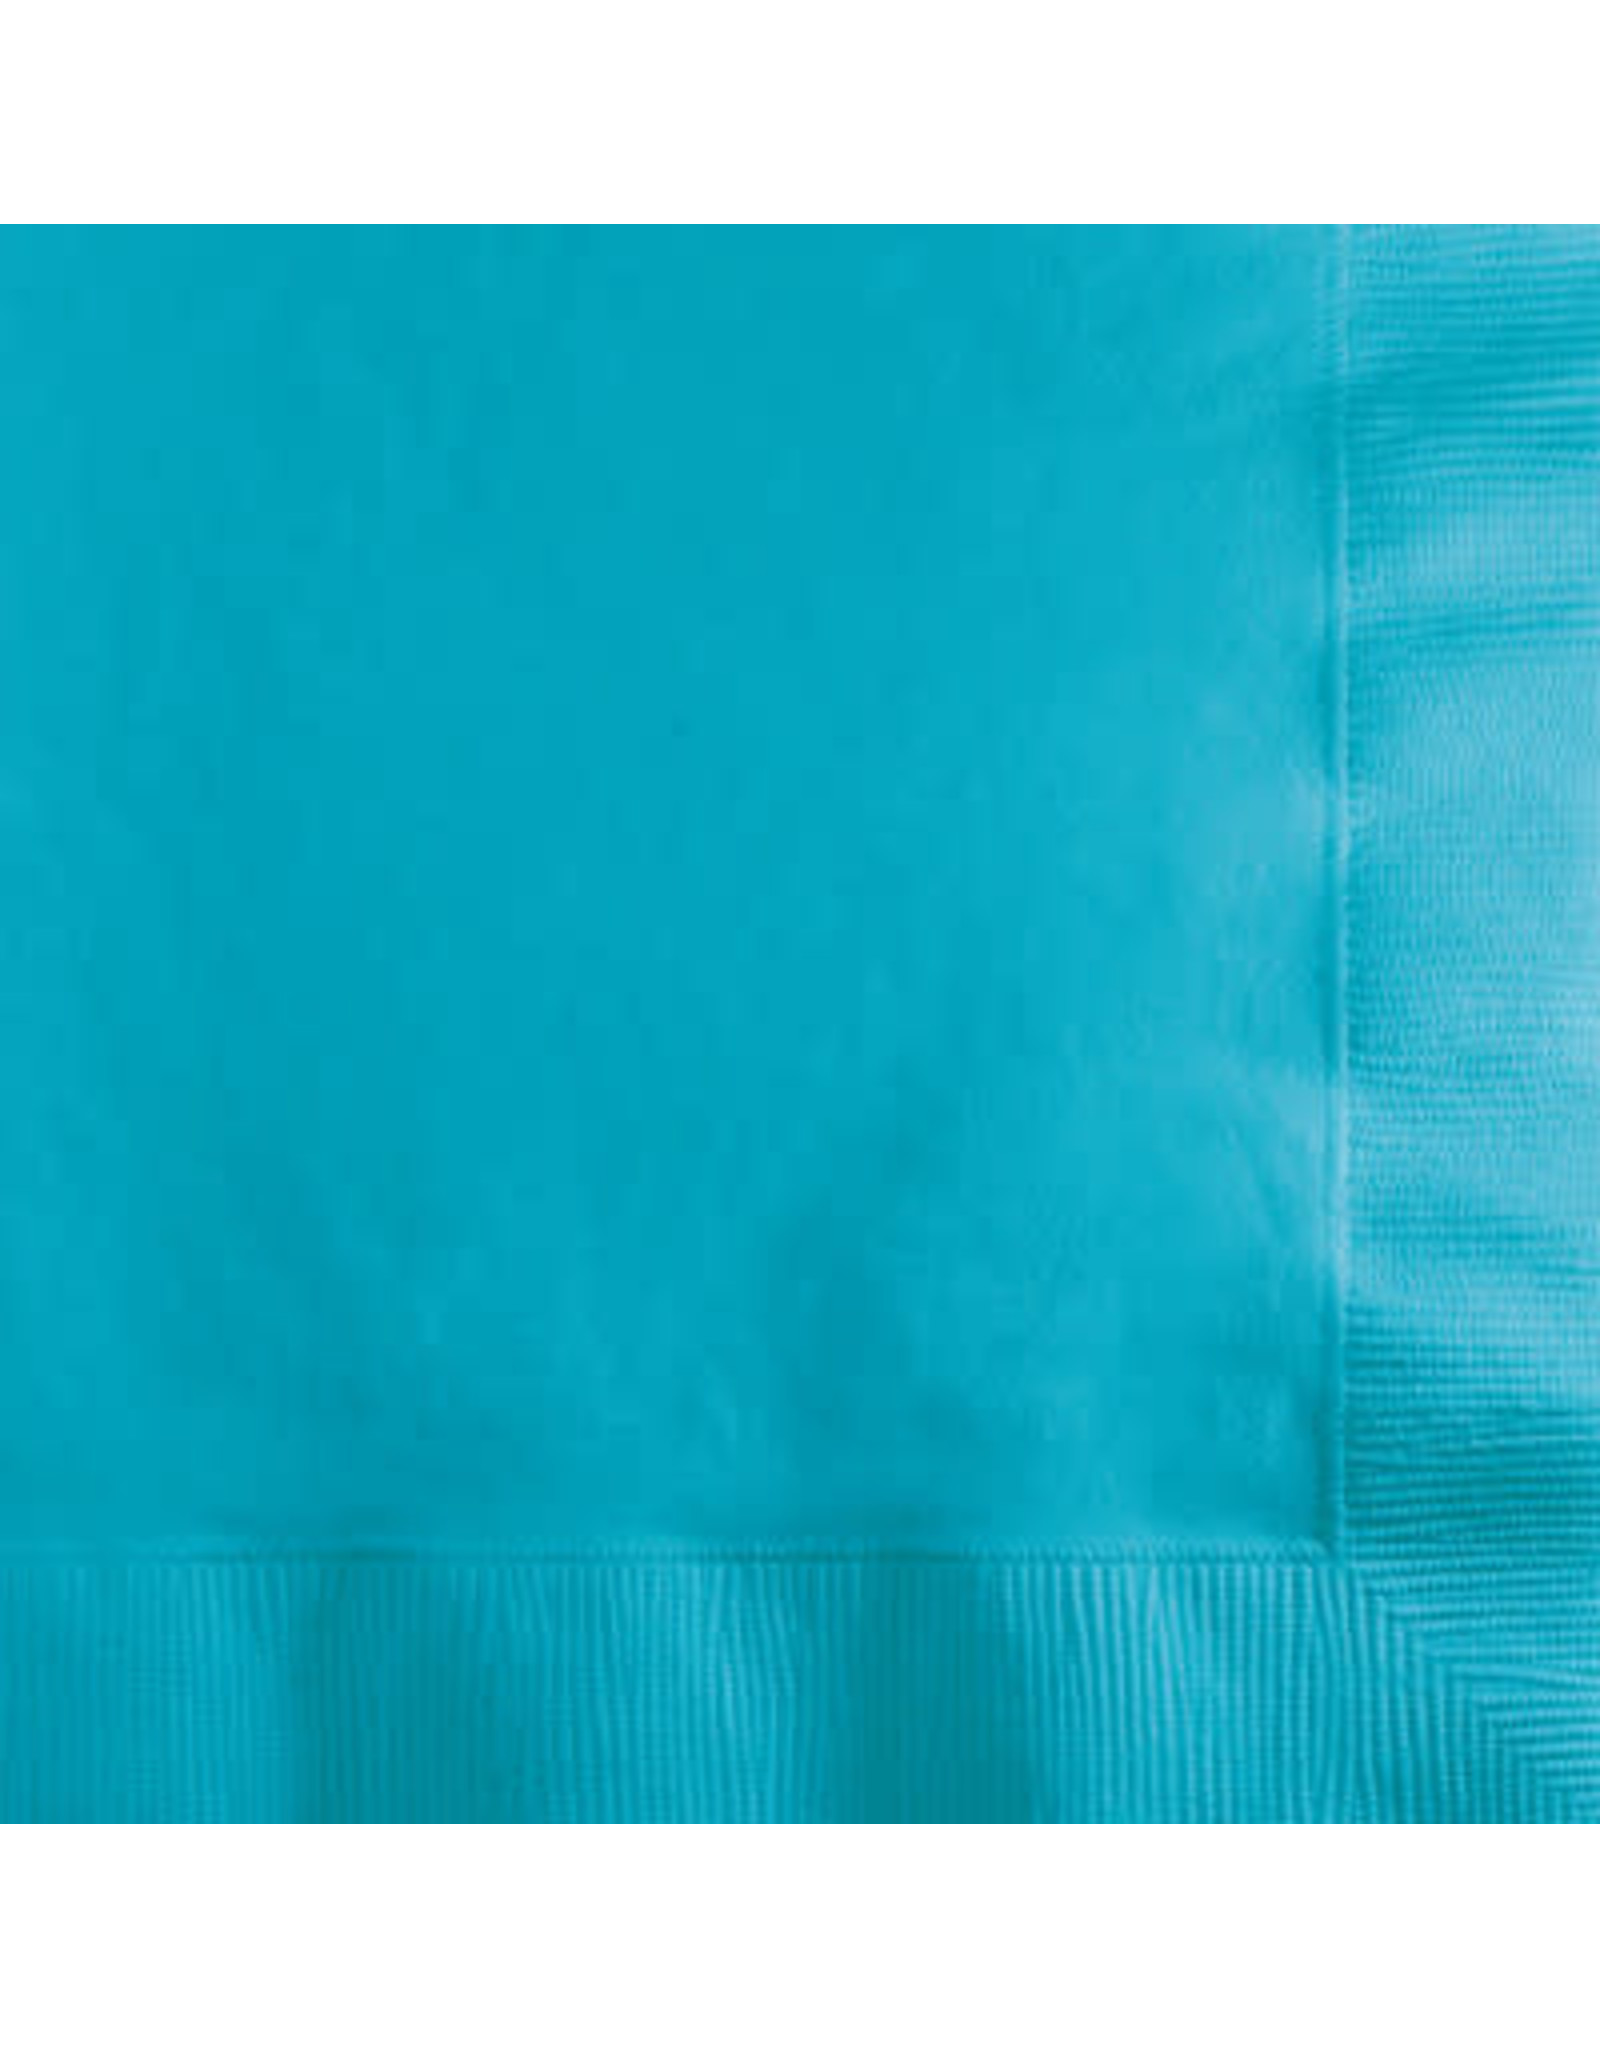 Touch of Color BERMUDA BLUE BEVERAGE NAPKINS